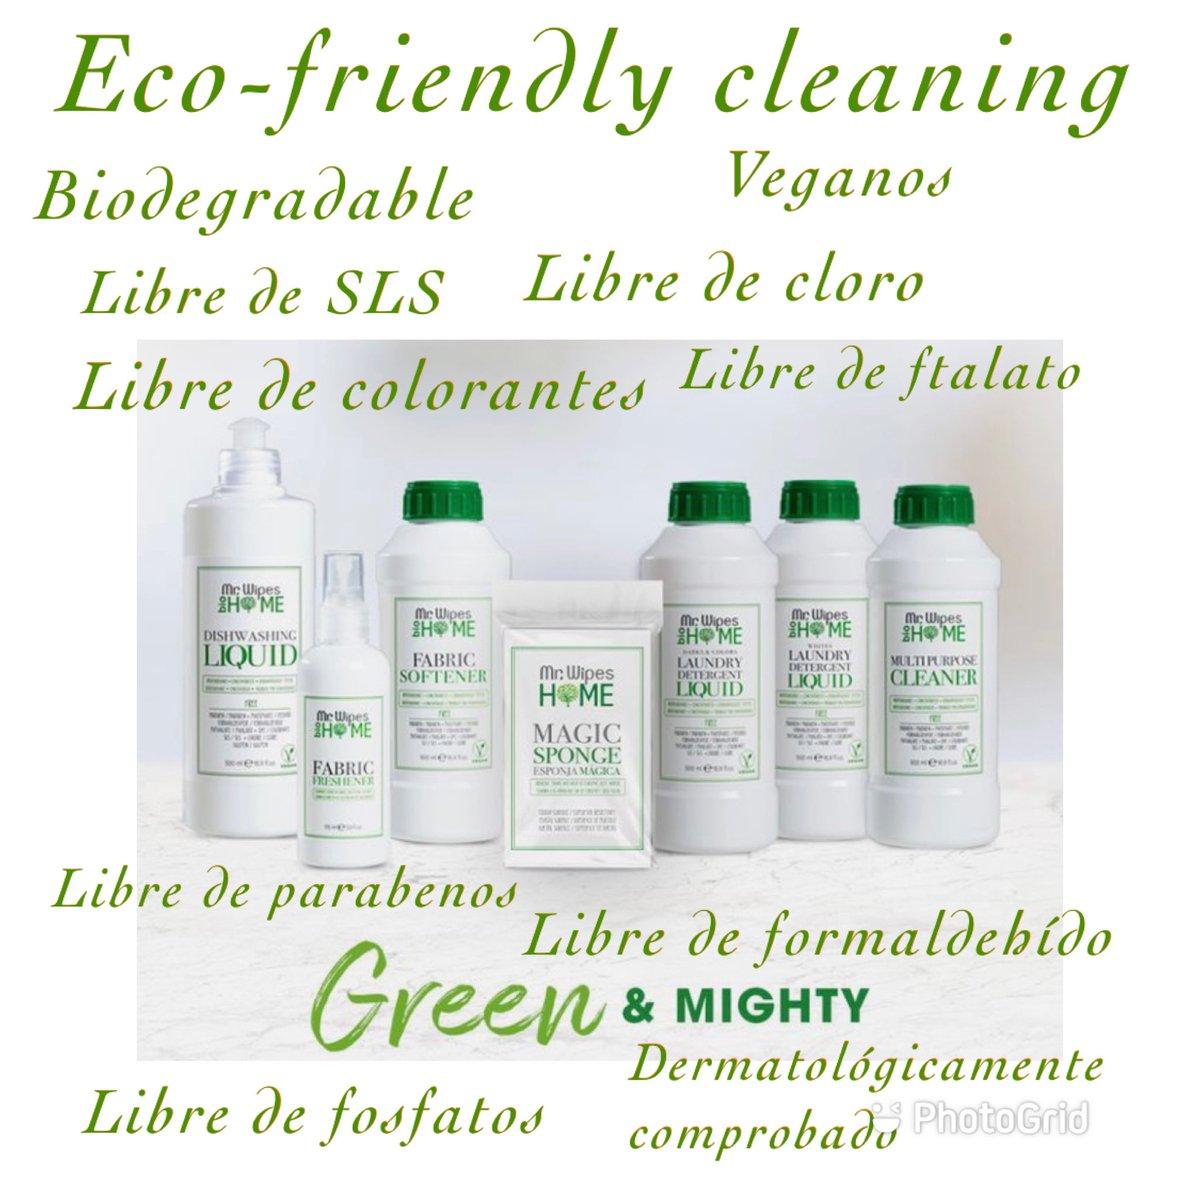 Para ti, que utilizas productos eco- amigables!! #Vegan #biodegradable #ecofriendly #farmasi #cleaning https://t.co/Id6dIdKqvF